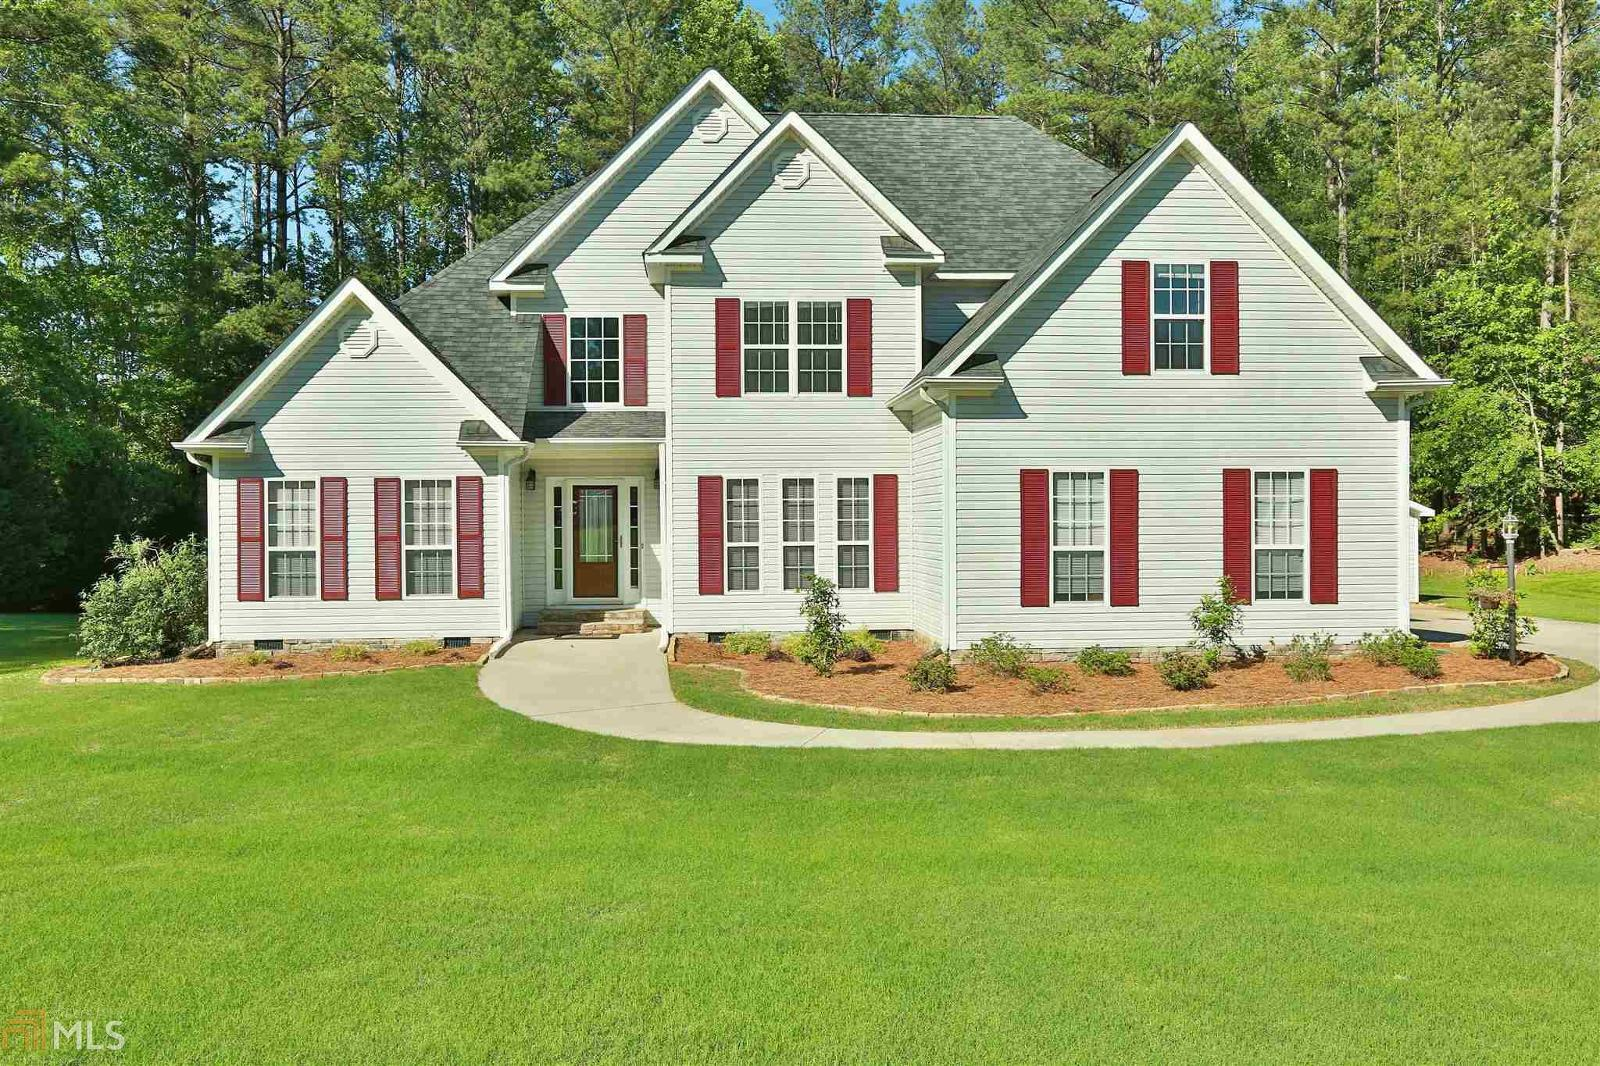 105 o dell rdg newnan ga mls 8254800 better homes Home builders newnan ga